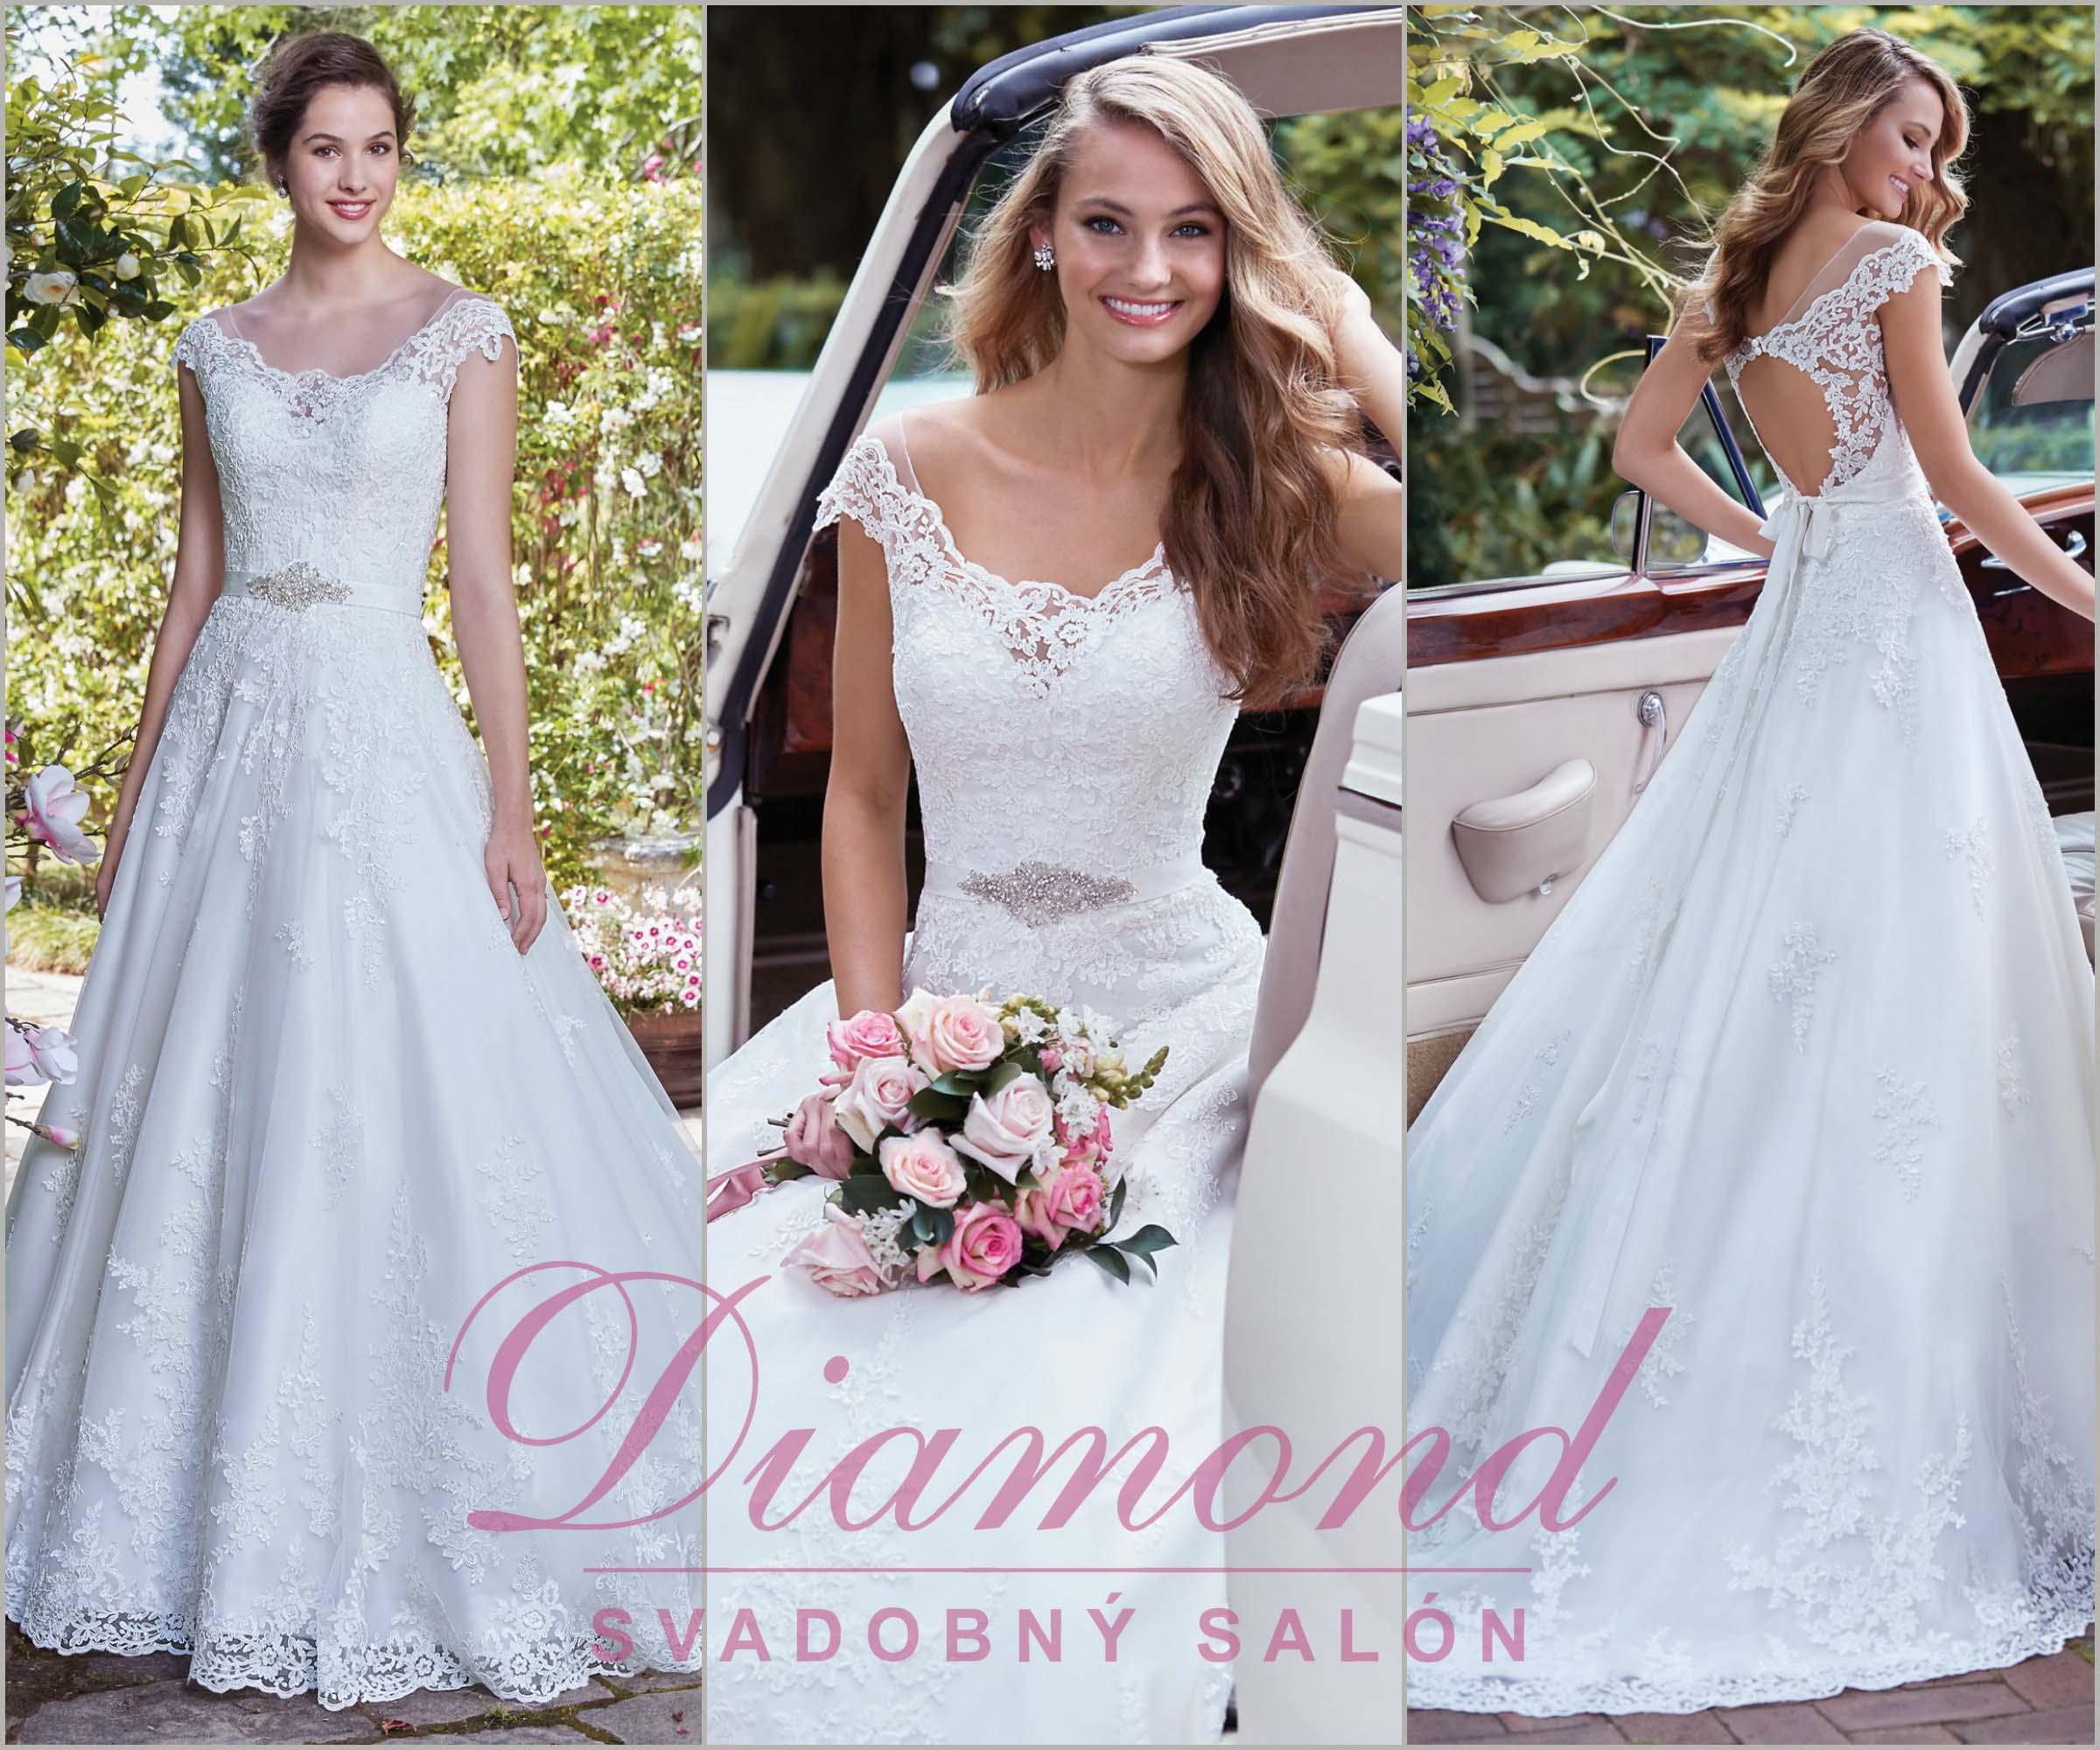 42b40d6738df Svadoný salón Diamond - všetko pre svadbu a - Móda